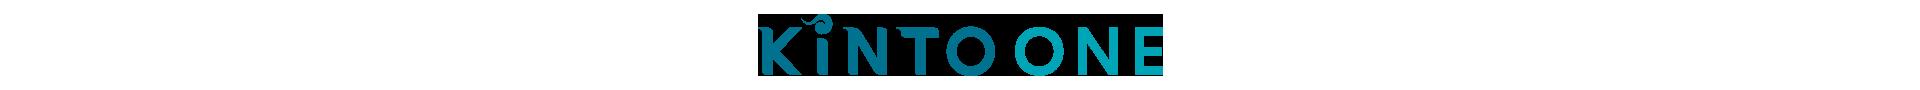 KINTO One Logo 2021 1920 1